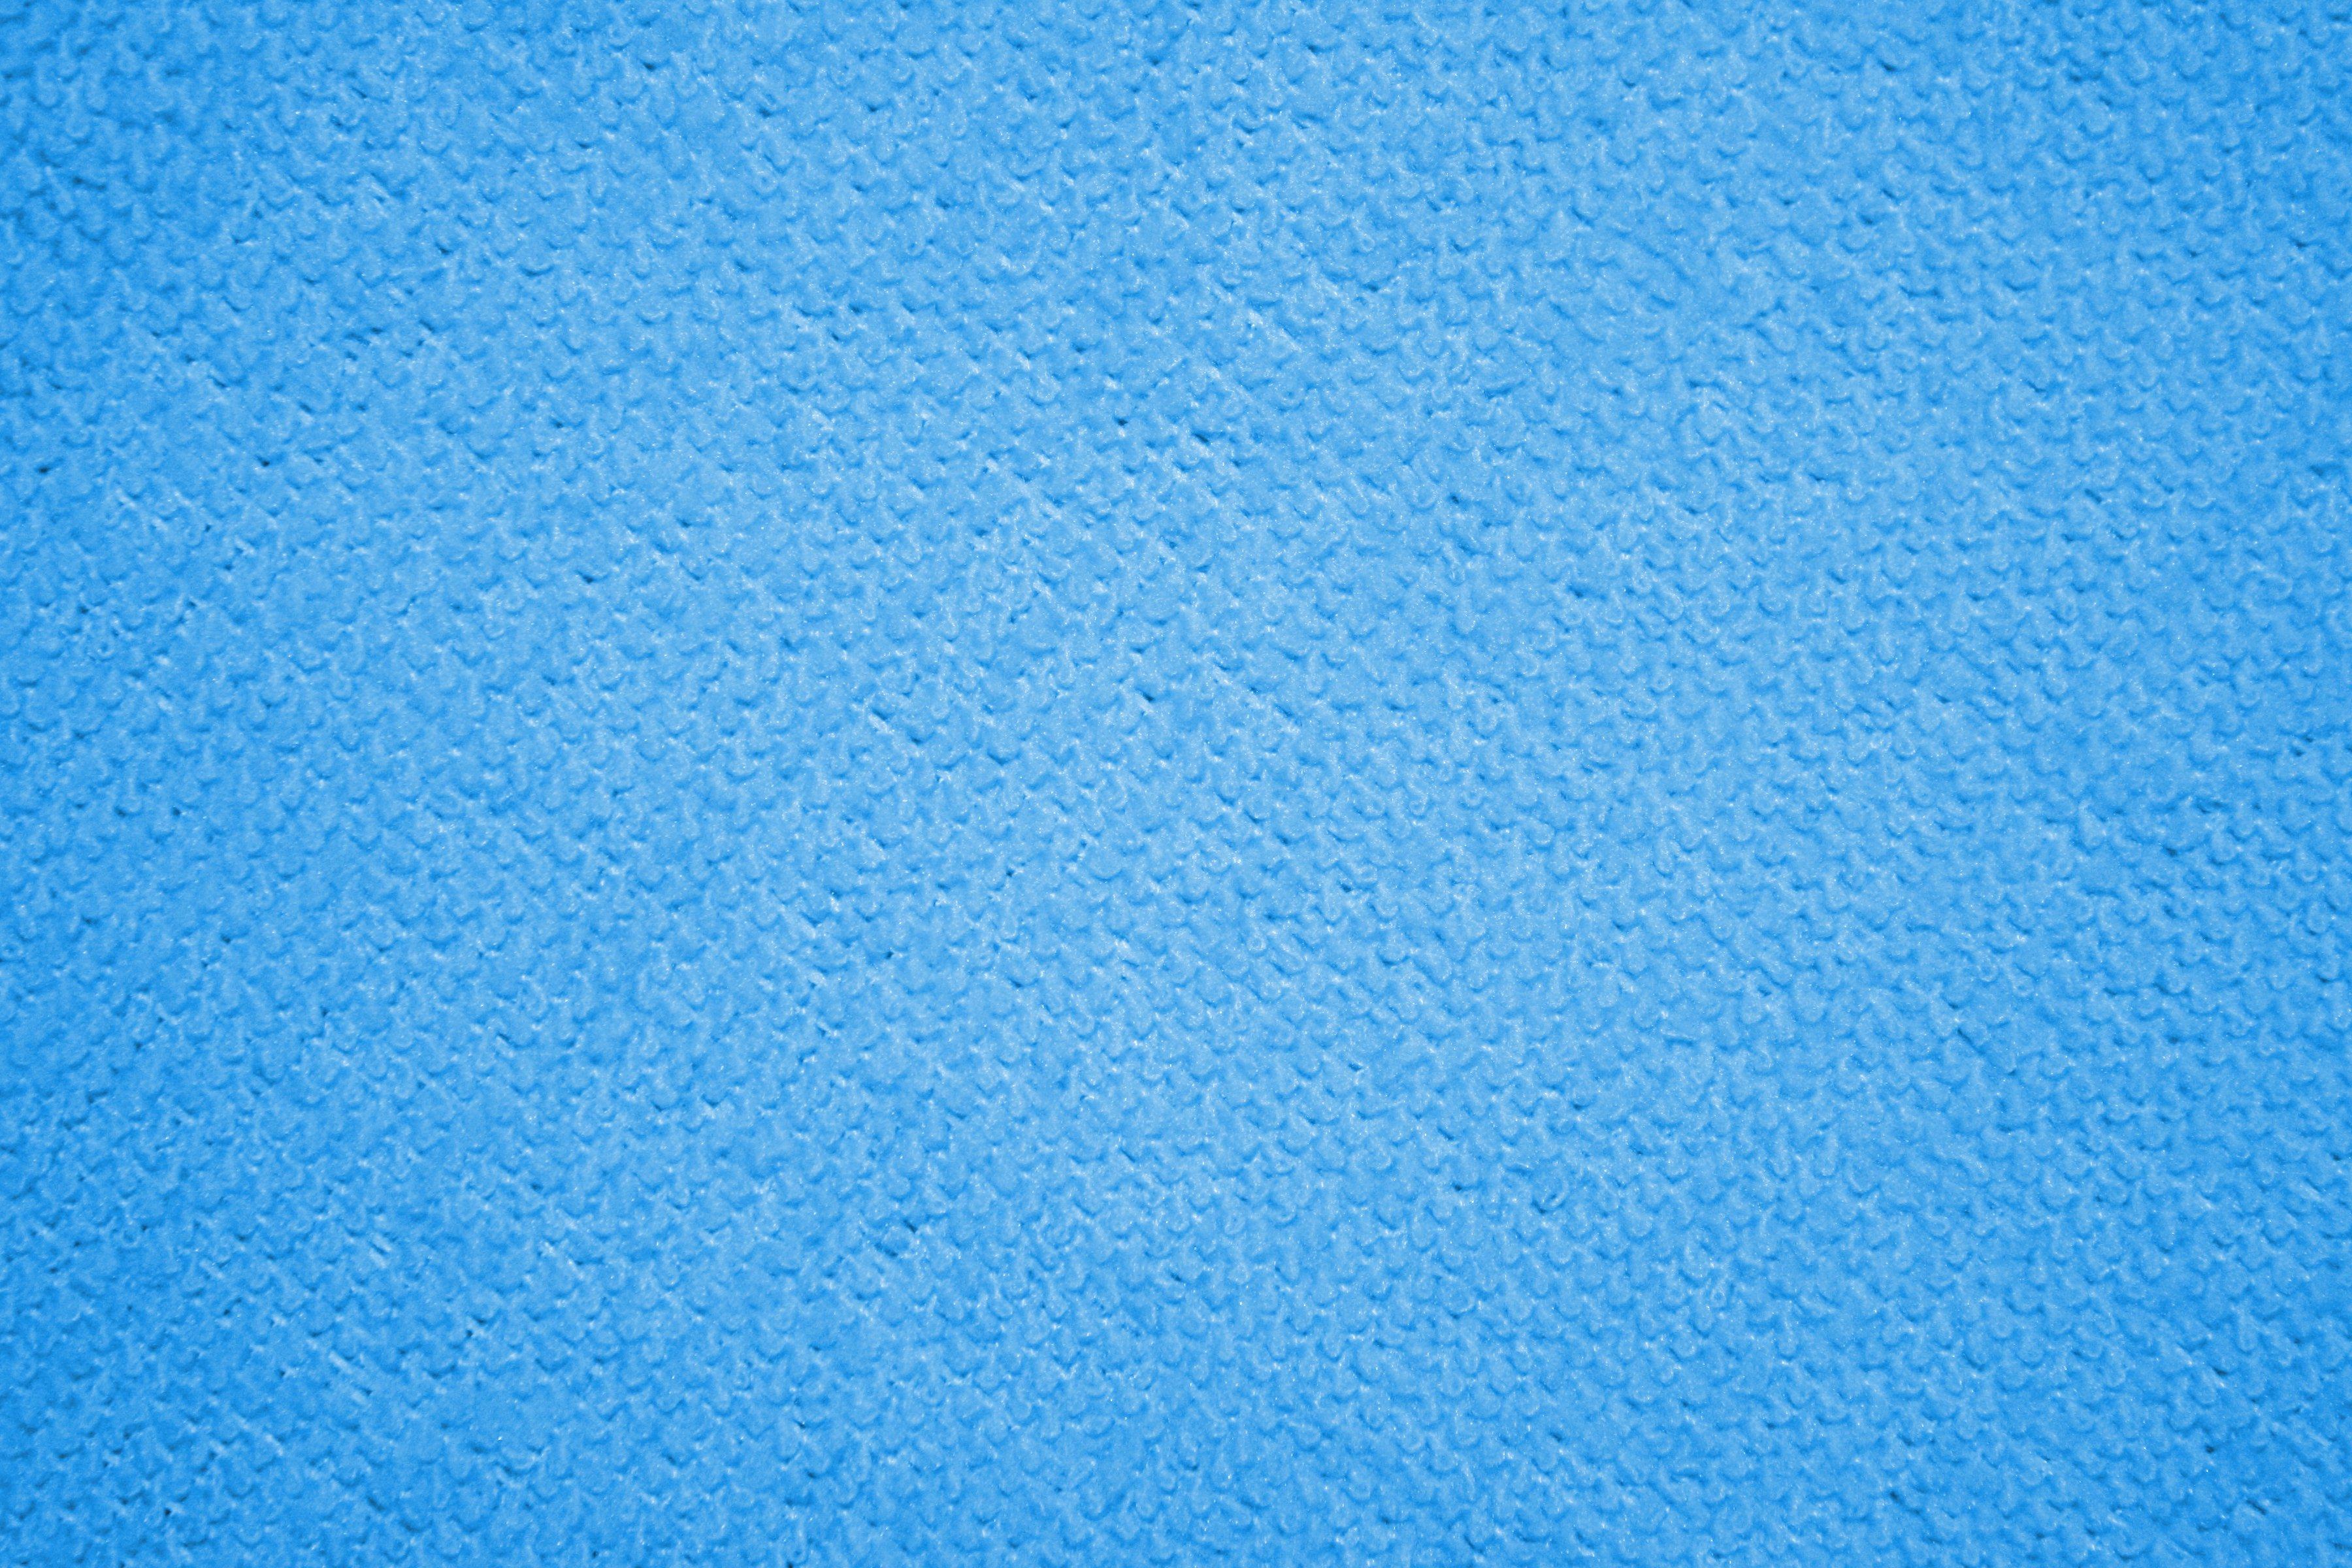 Azure Blue Microfiber Cloth Fabric Texture Picture   Free Photograph ...